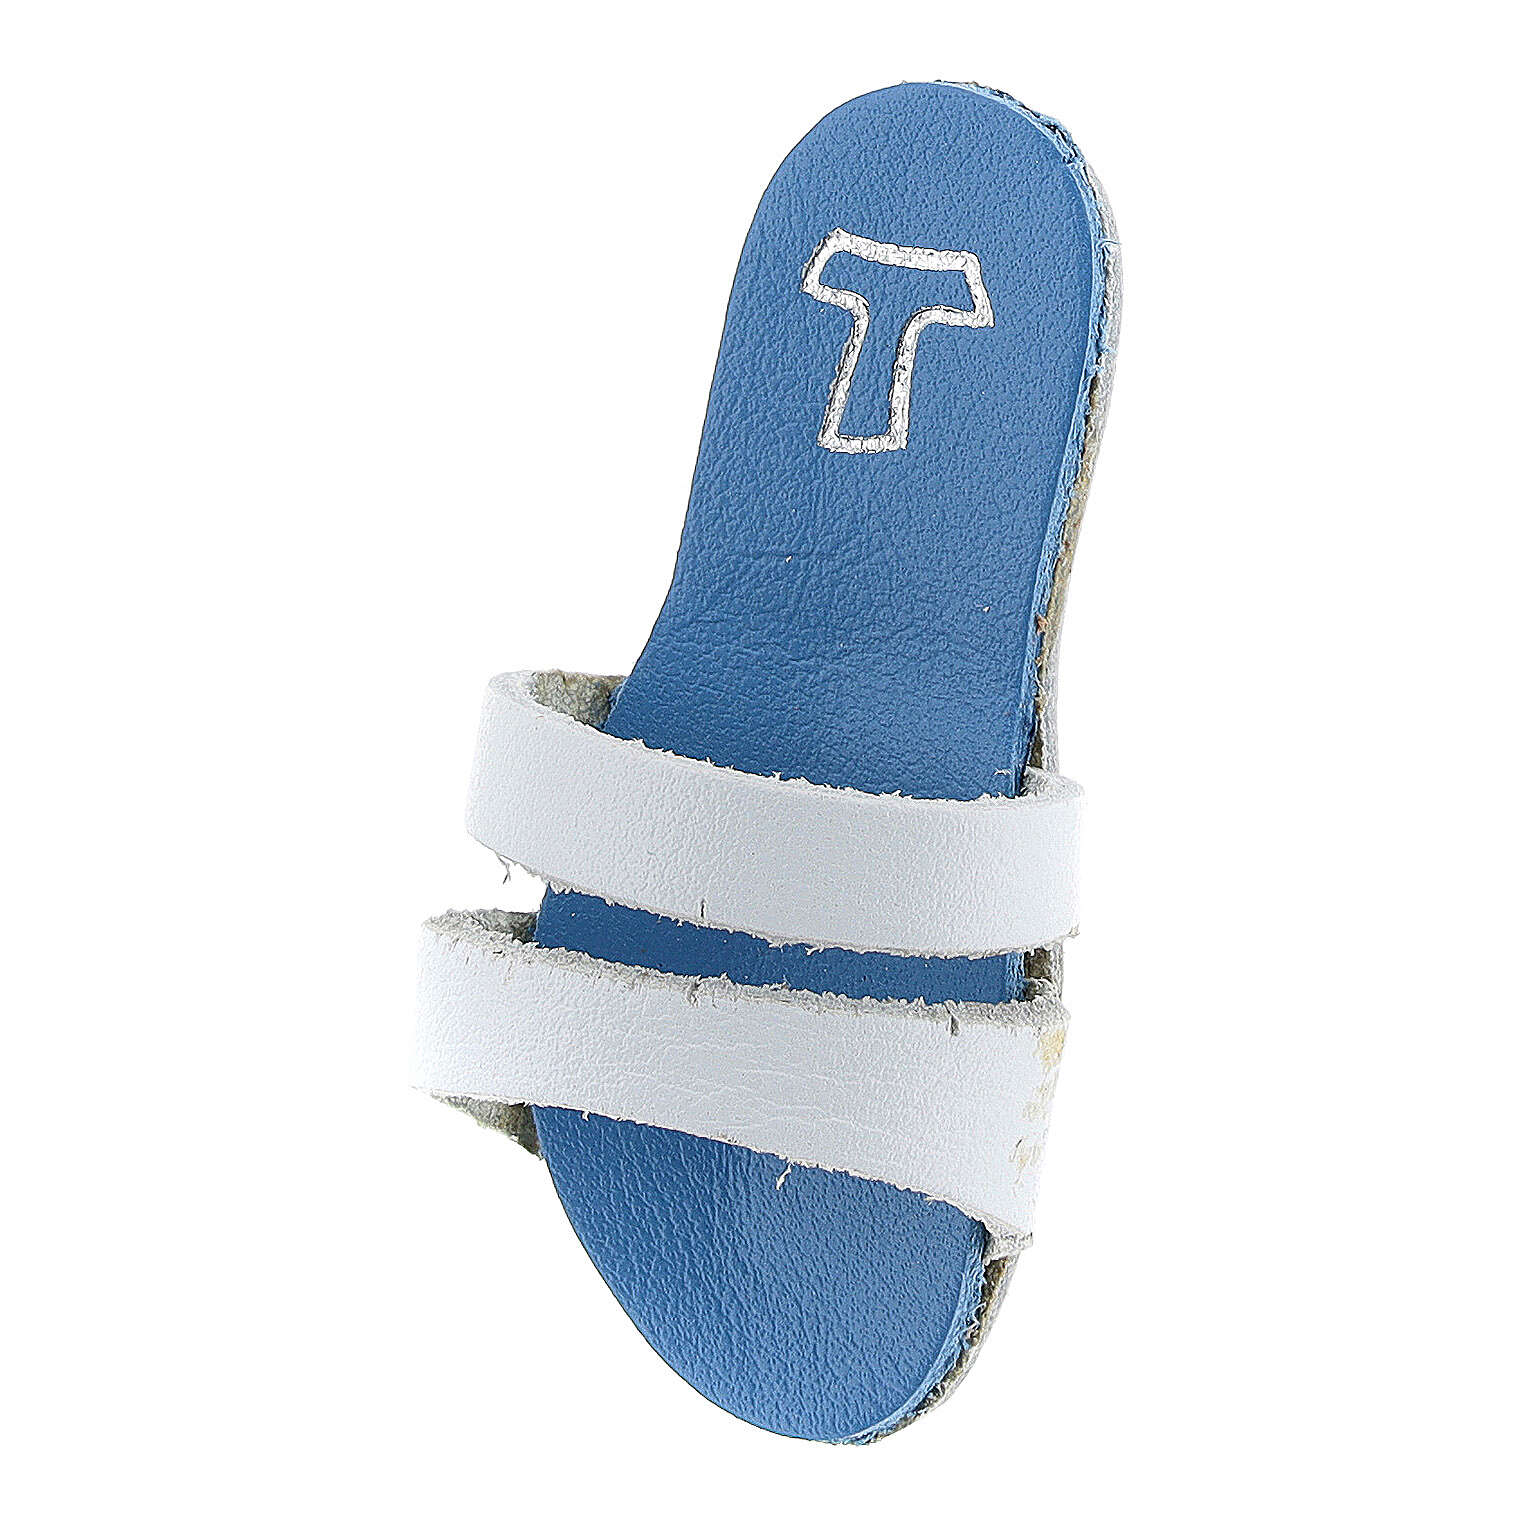 Light blue sandal-shaped real leather Tau magnet 6 cm 3